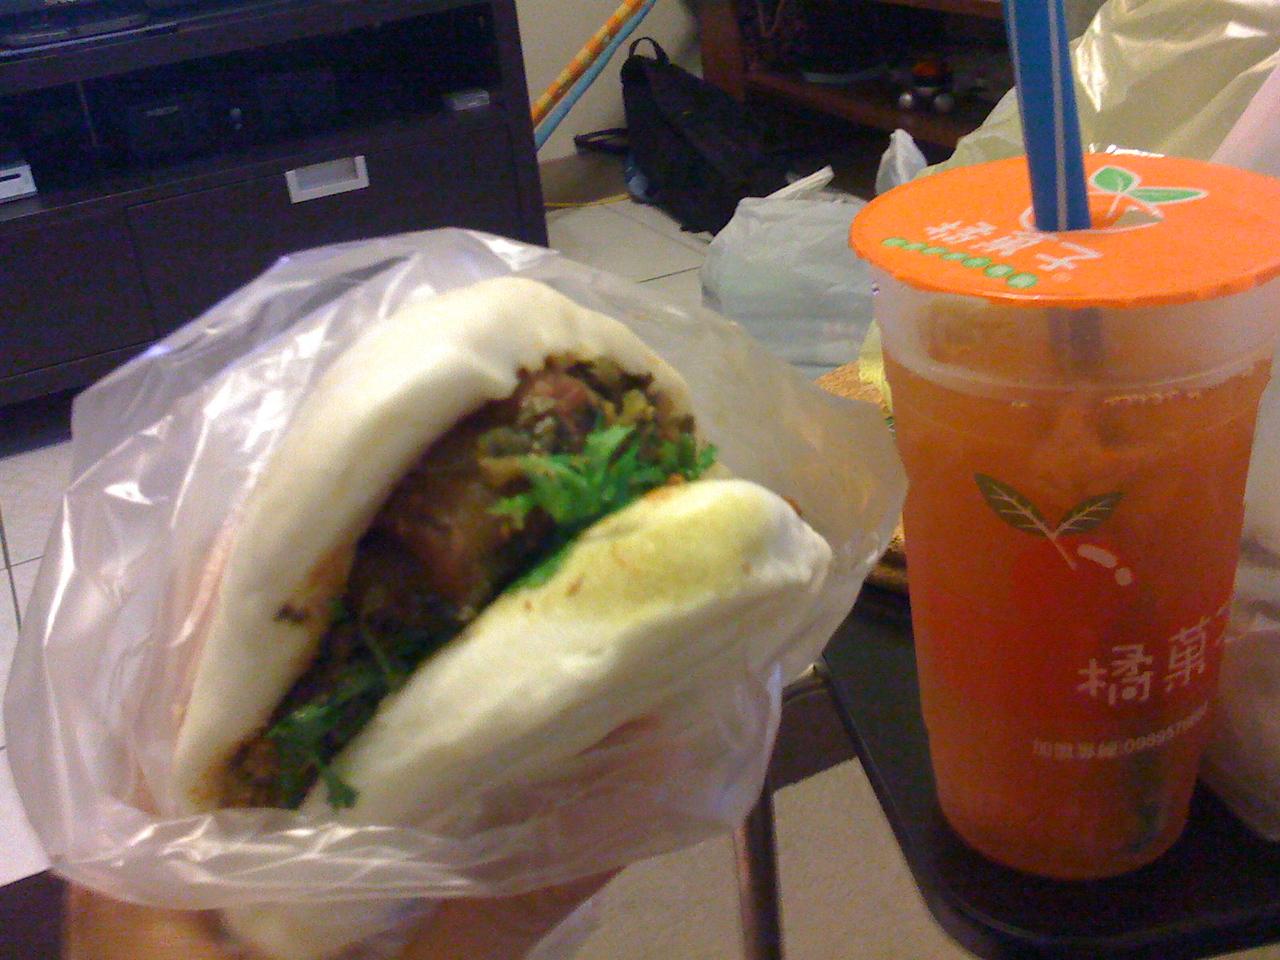 2008 11 25 Tue - Gua4 Bao1 and grapefruit drink